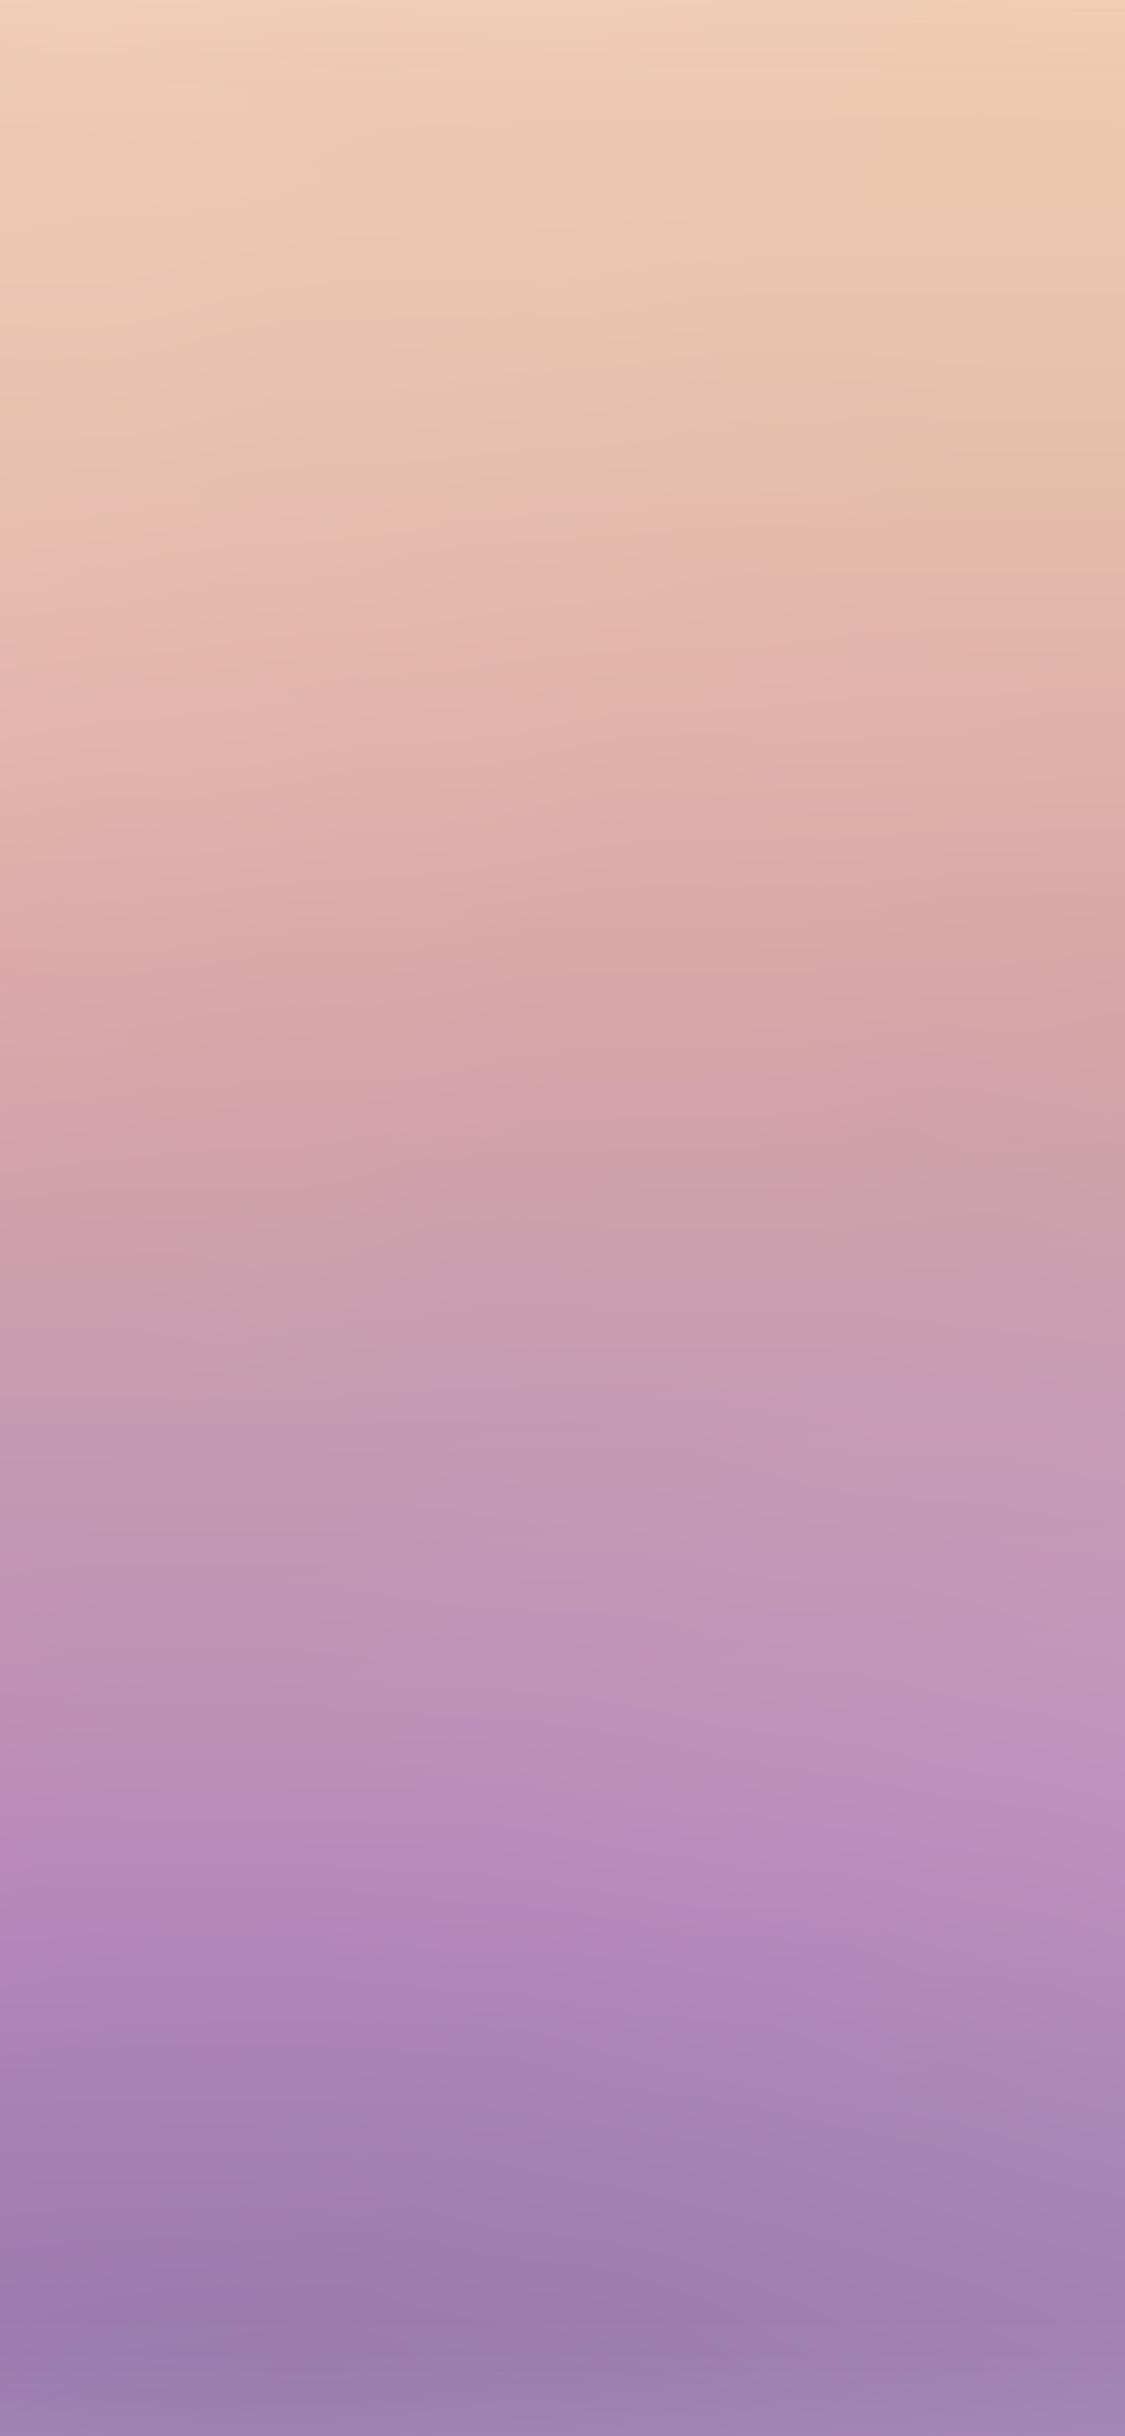 iPhoneXpapers.com-Apple-iPhone-wallpaper-sl84-pastel-pink-purple-blur-gradation